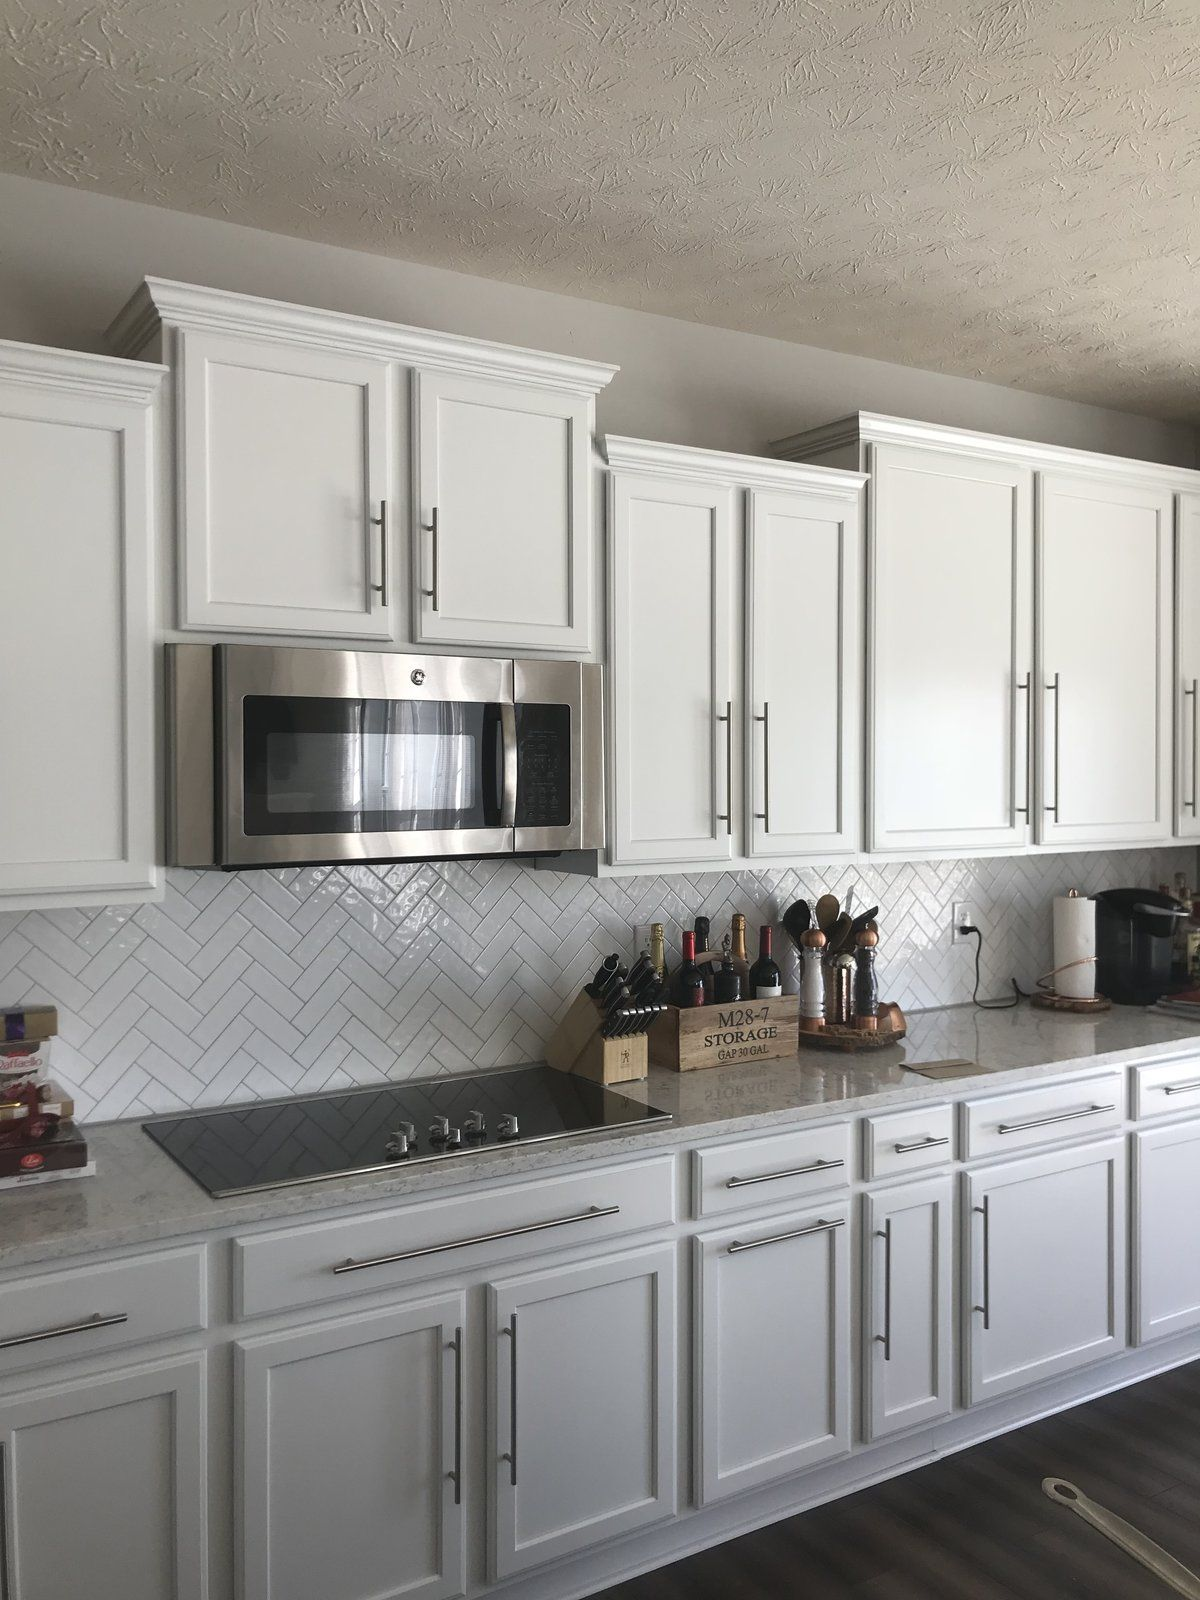 9 Center To Center Bar Pull Kitchen Remodel Small White